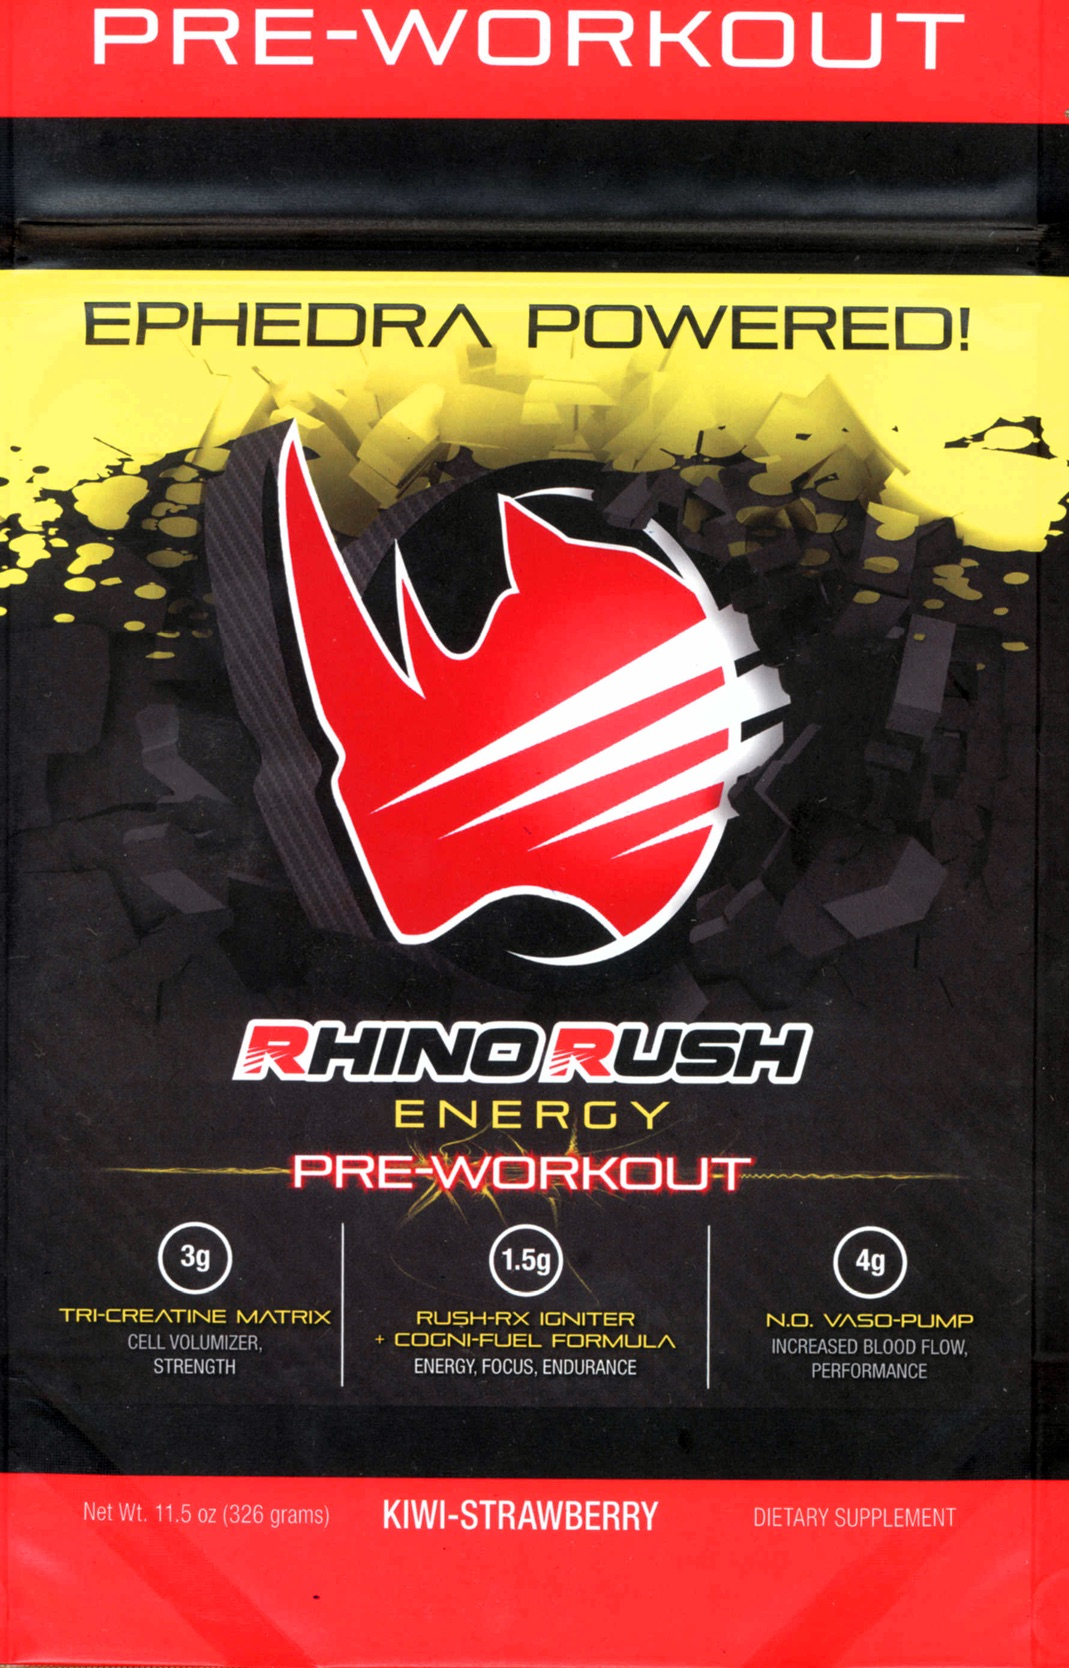 Rhino Rush Pre-Workout Powder